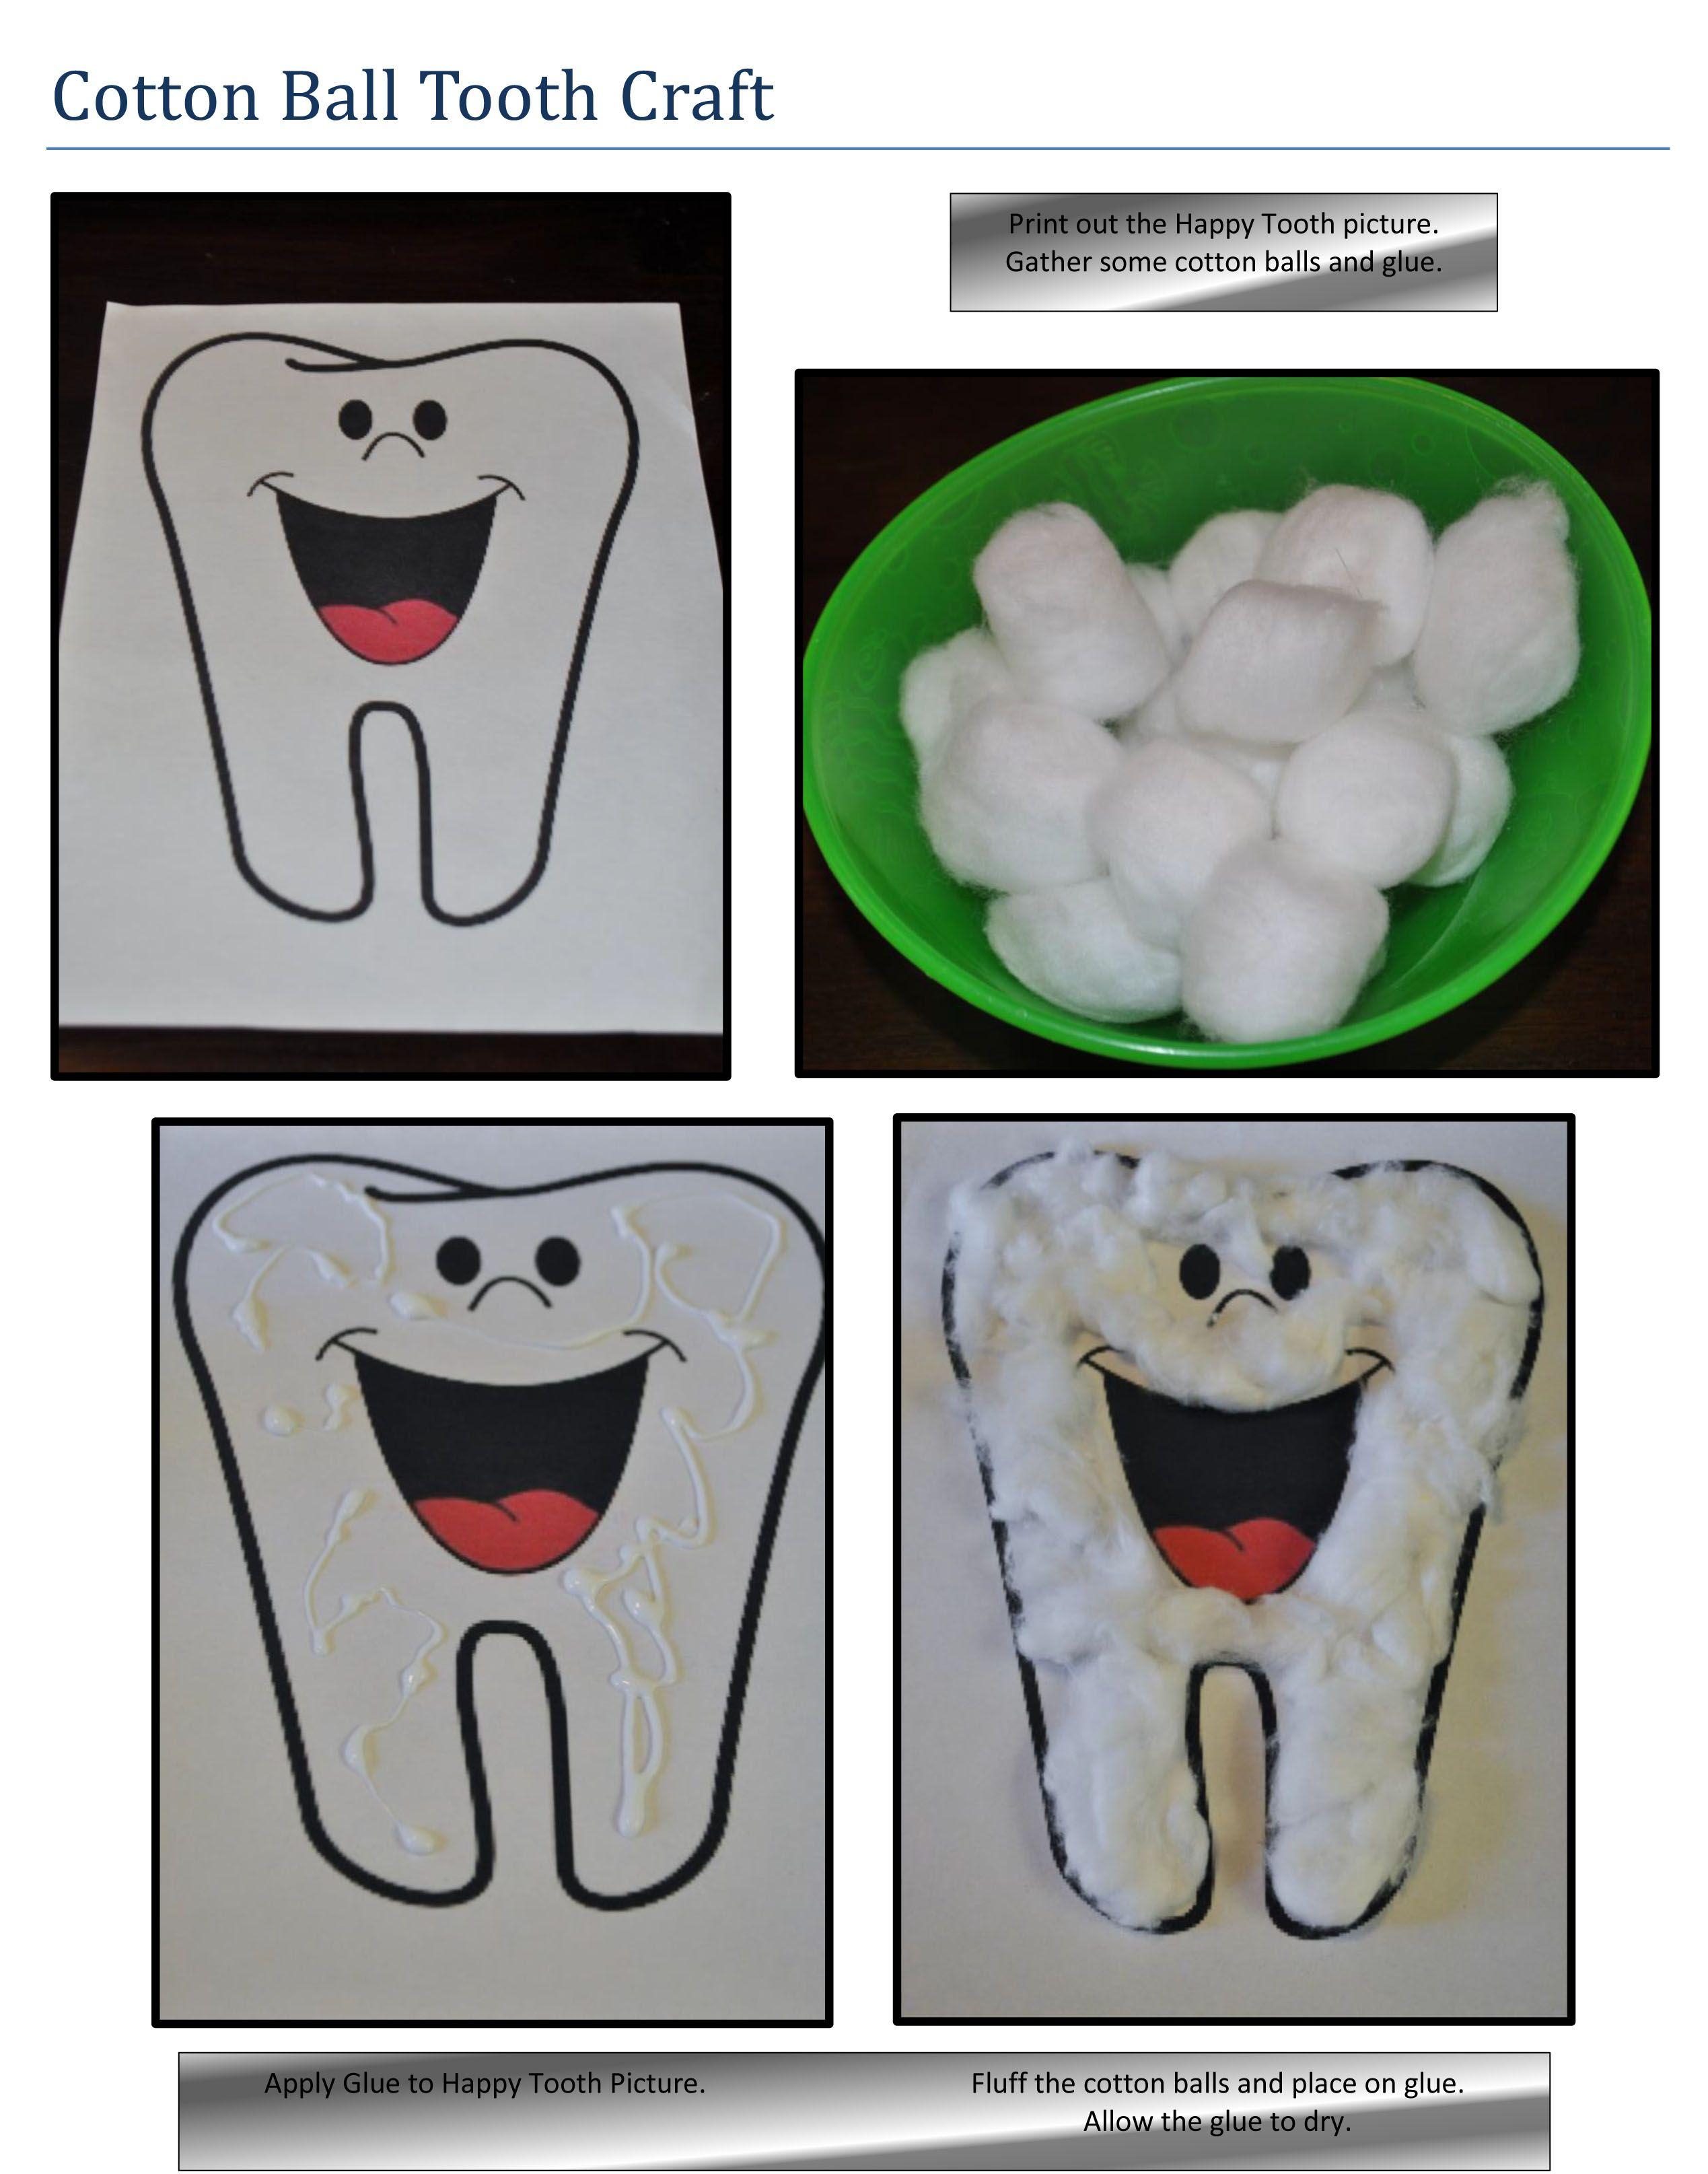 Cotton Ball Tooth Craft Dental Health Preschool Preschool Crafts Dental Health [ 3230 x 2538 Pixel ]